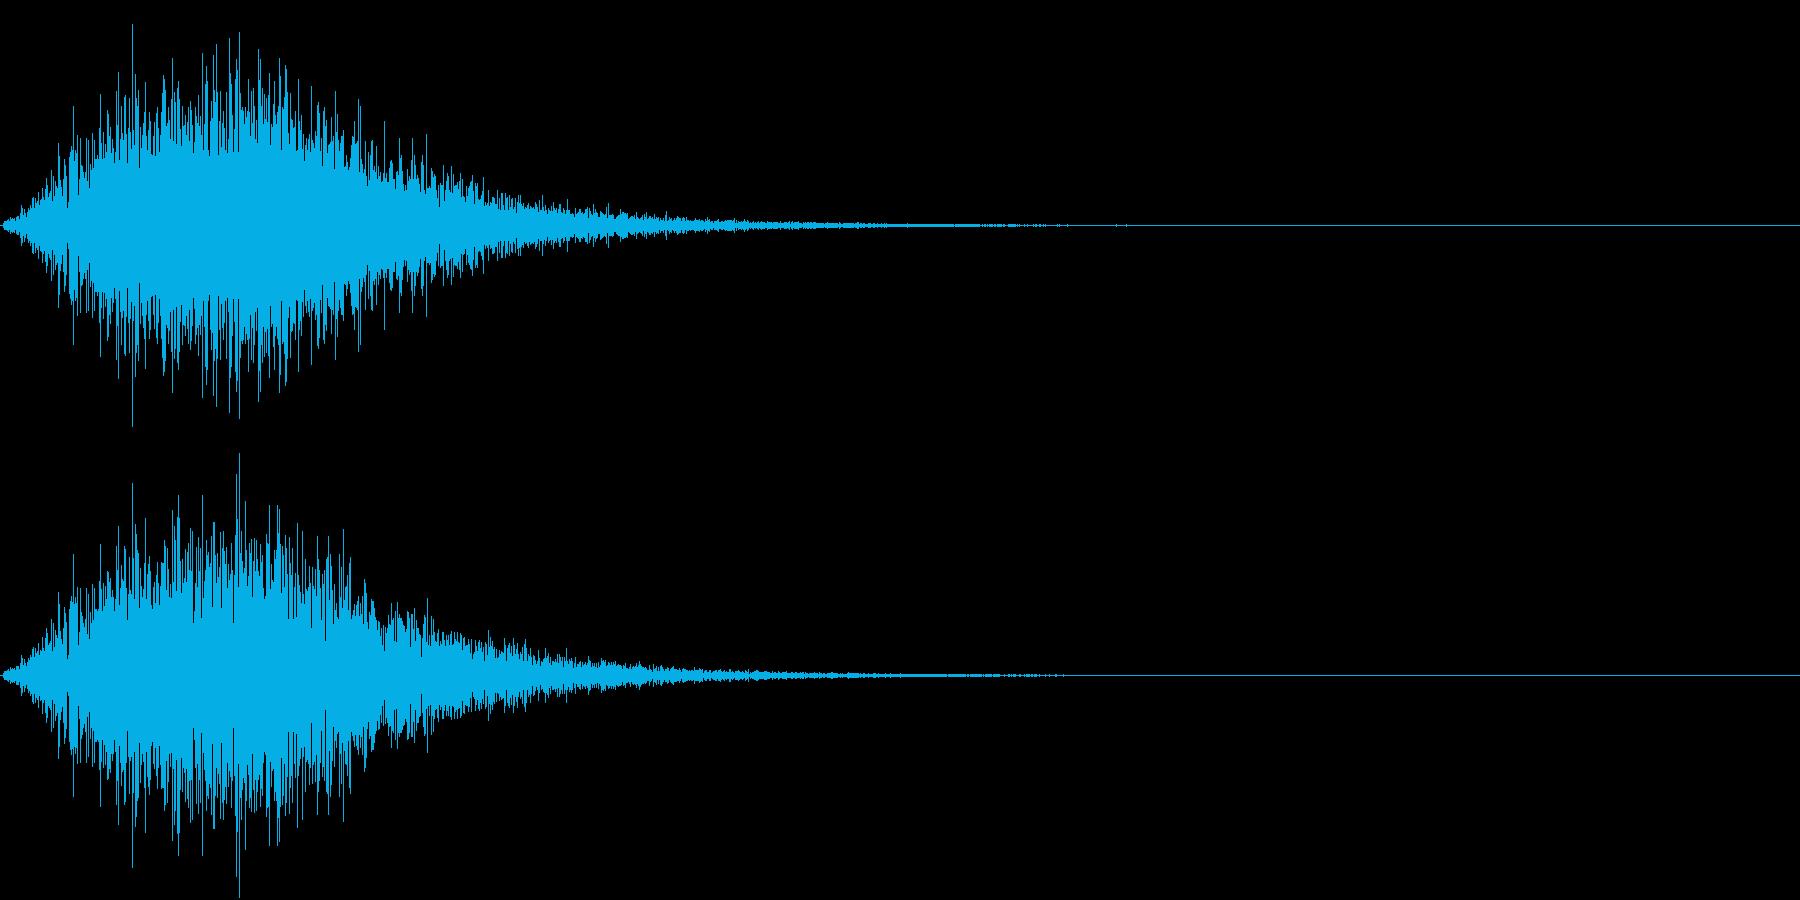 Battle 戦闘エフェクト音 11の再生済みの波形